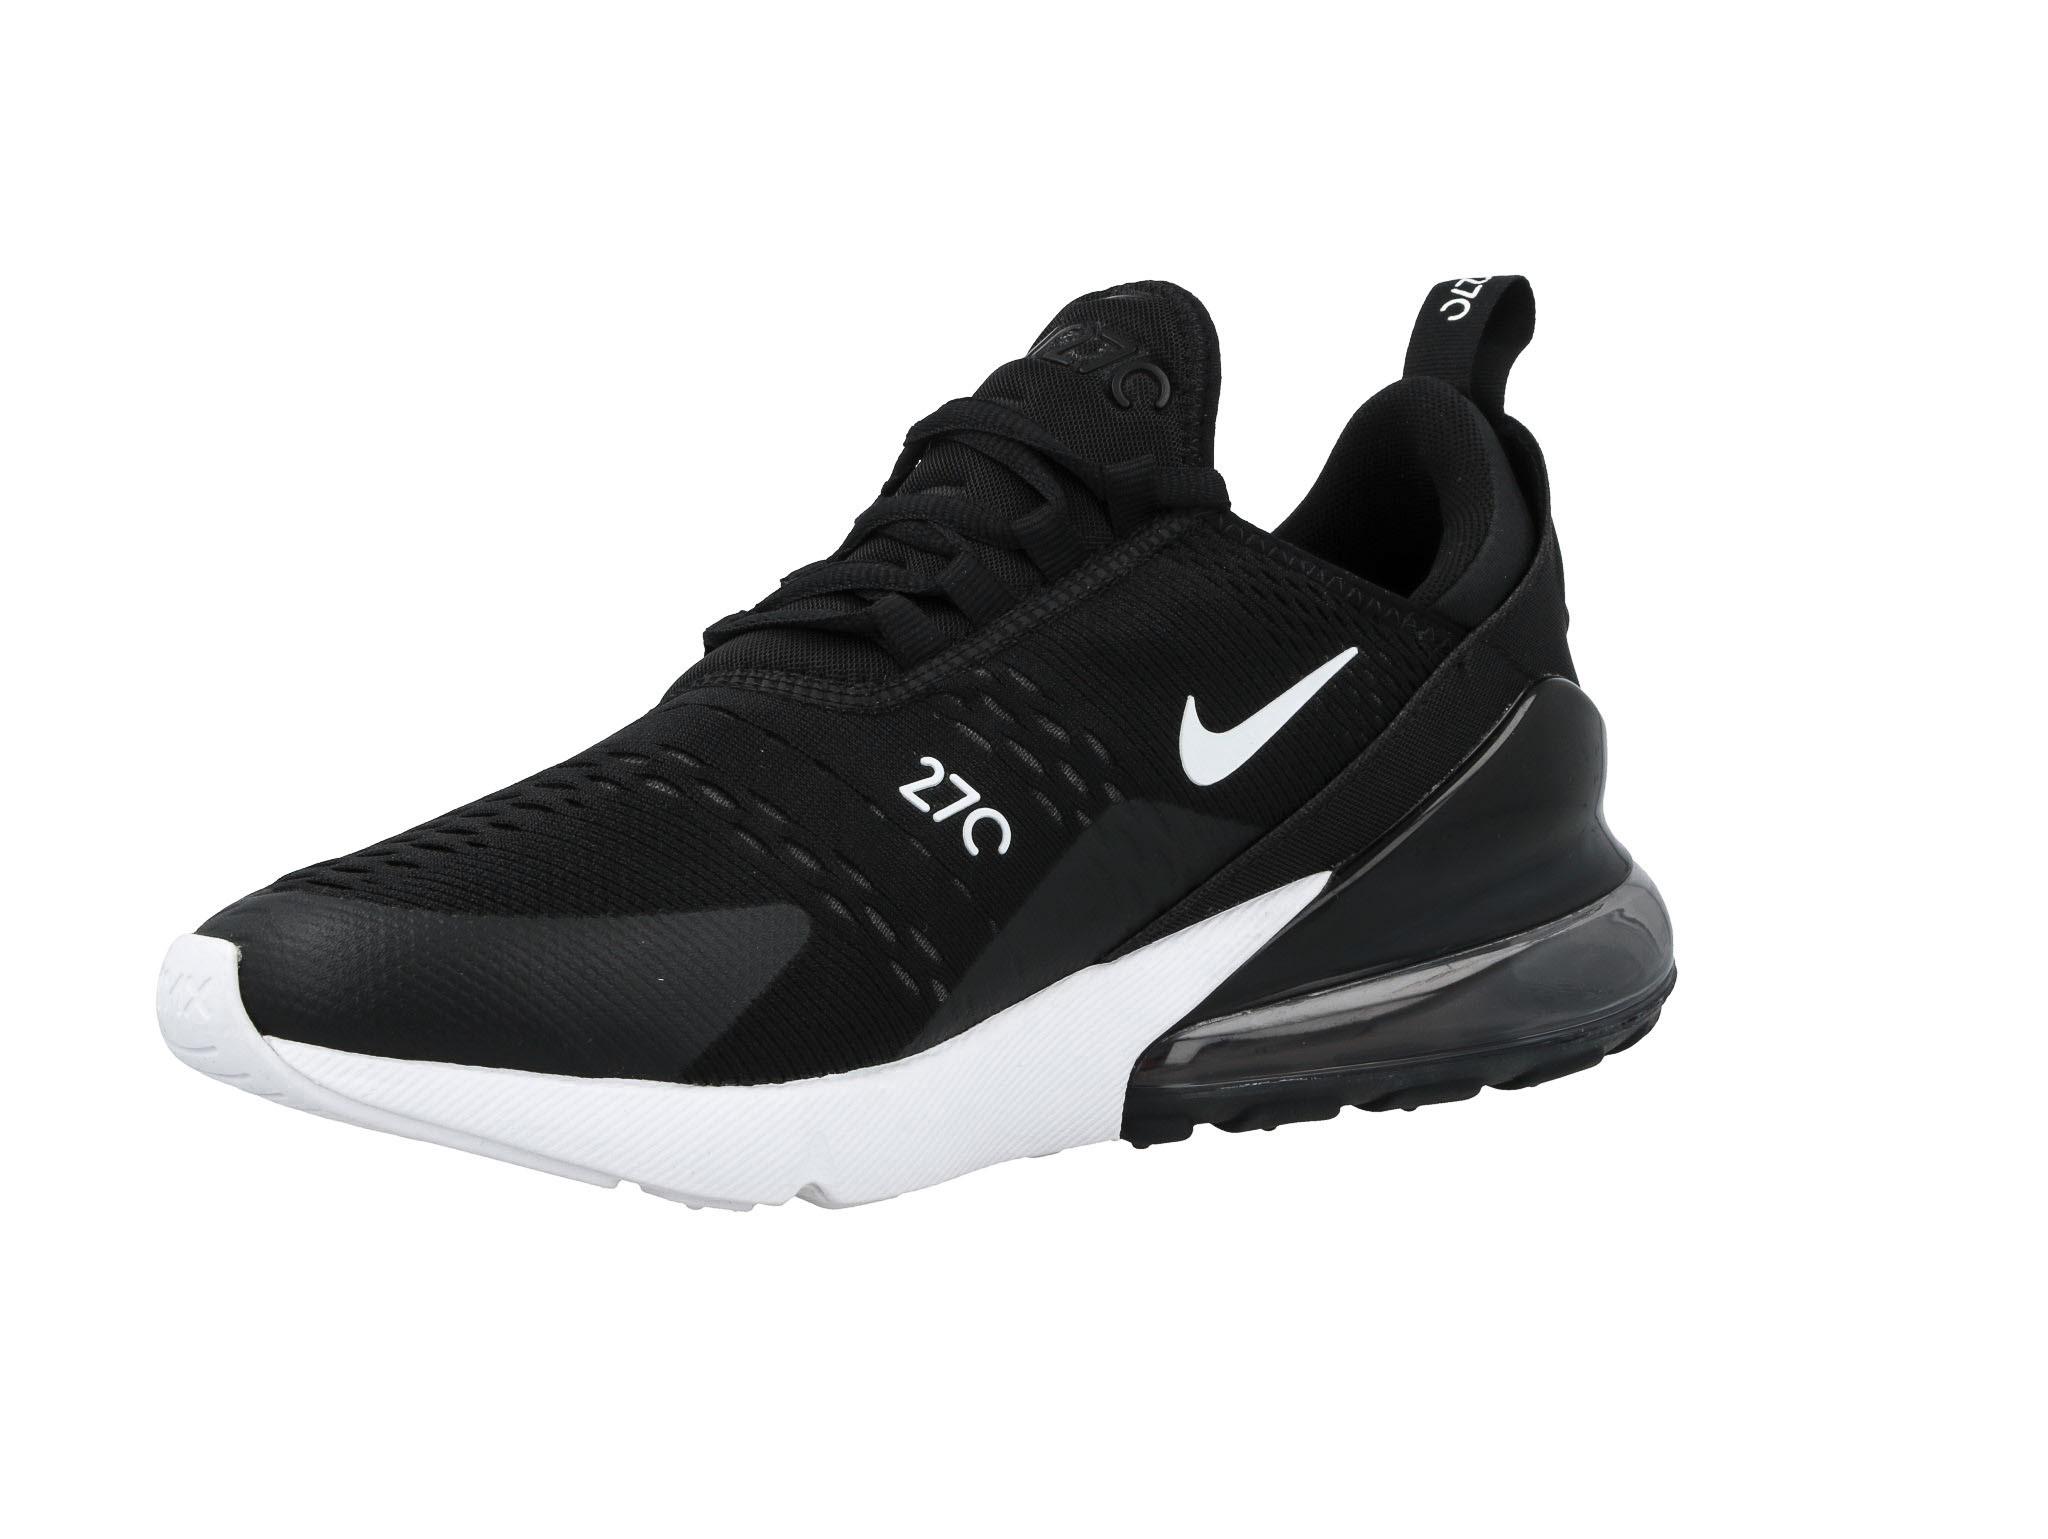 Sneakers Buty Air Max 270 blackanthracite white (AH8050 002)